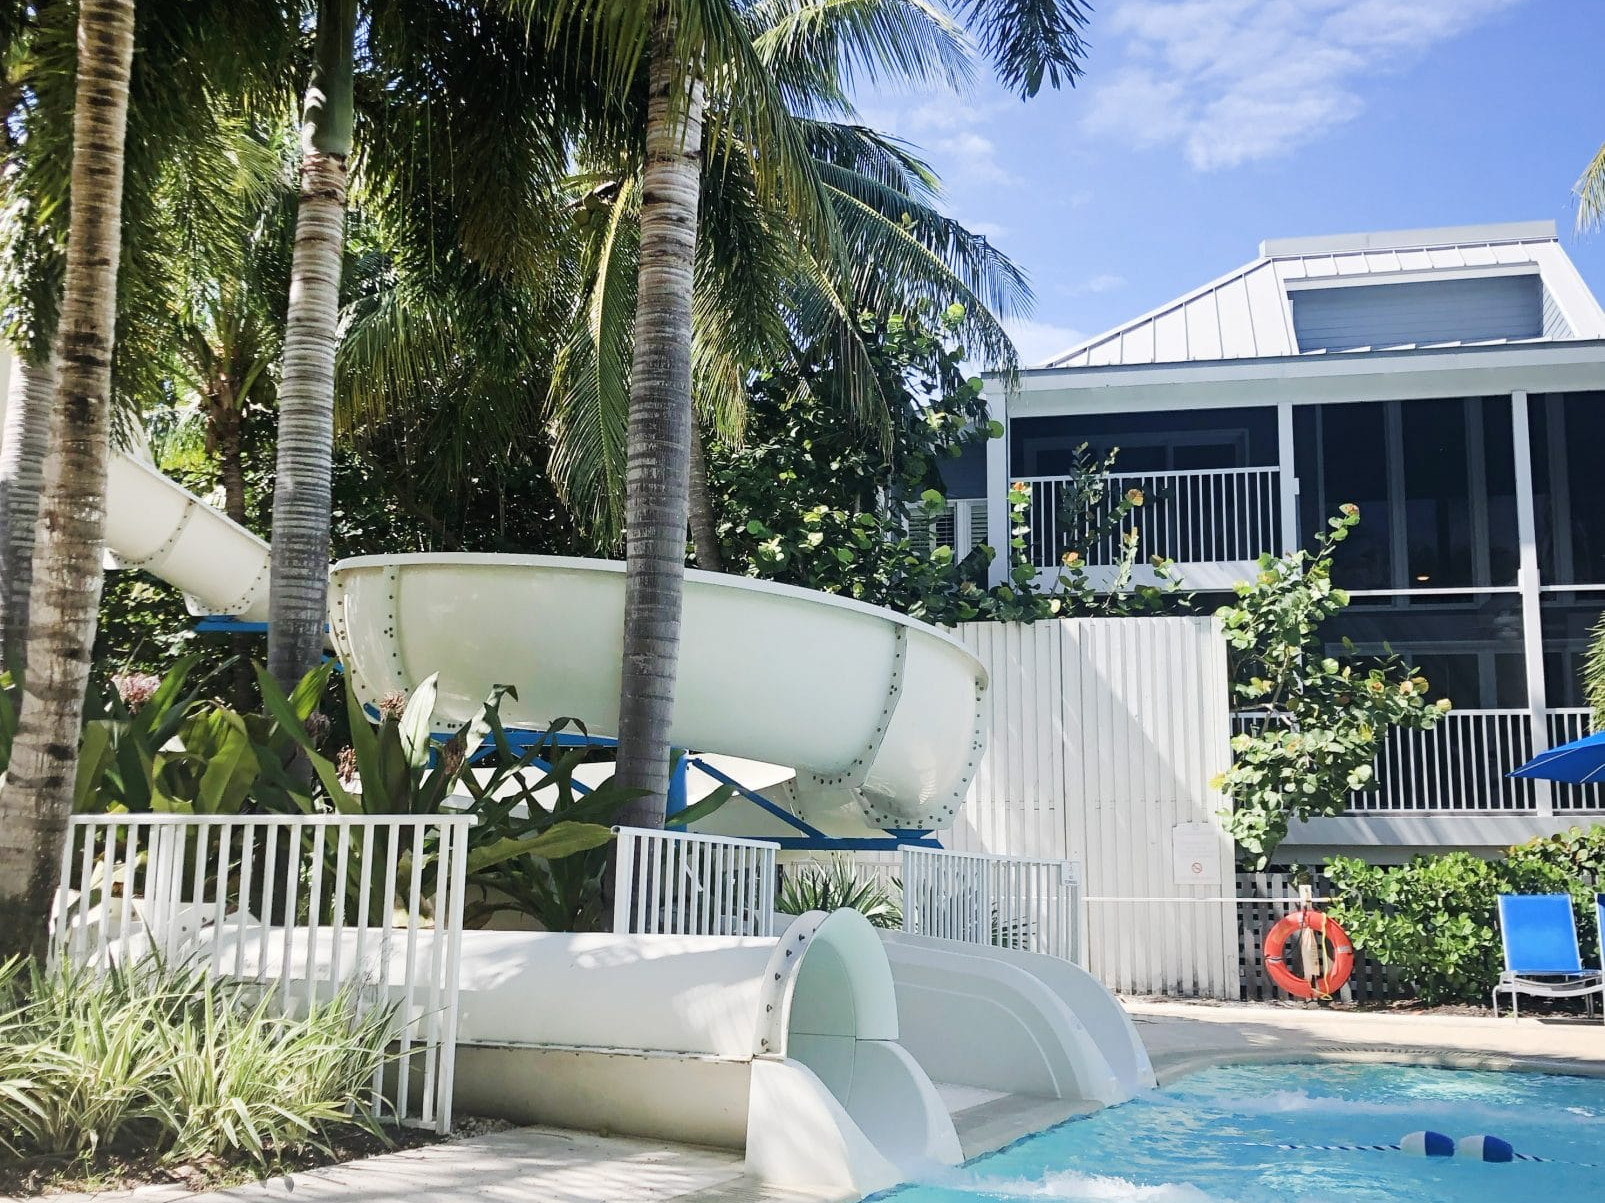 South East Captiva Resort